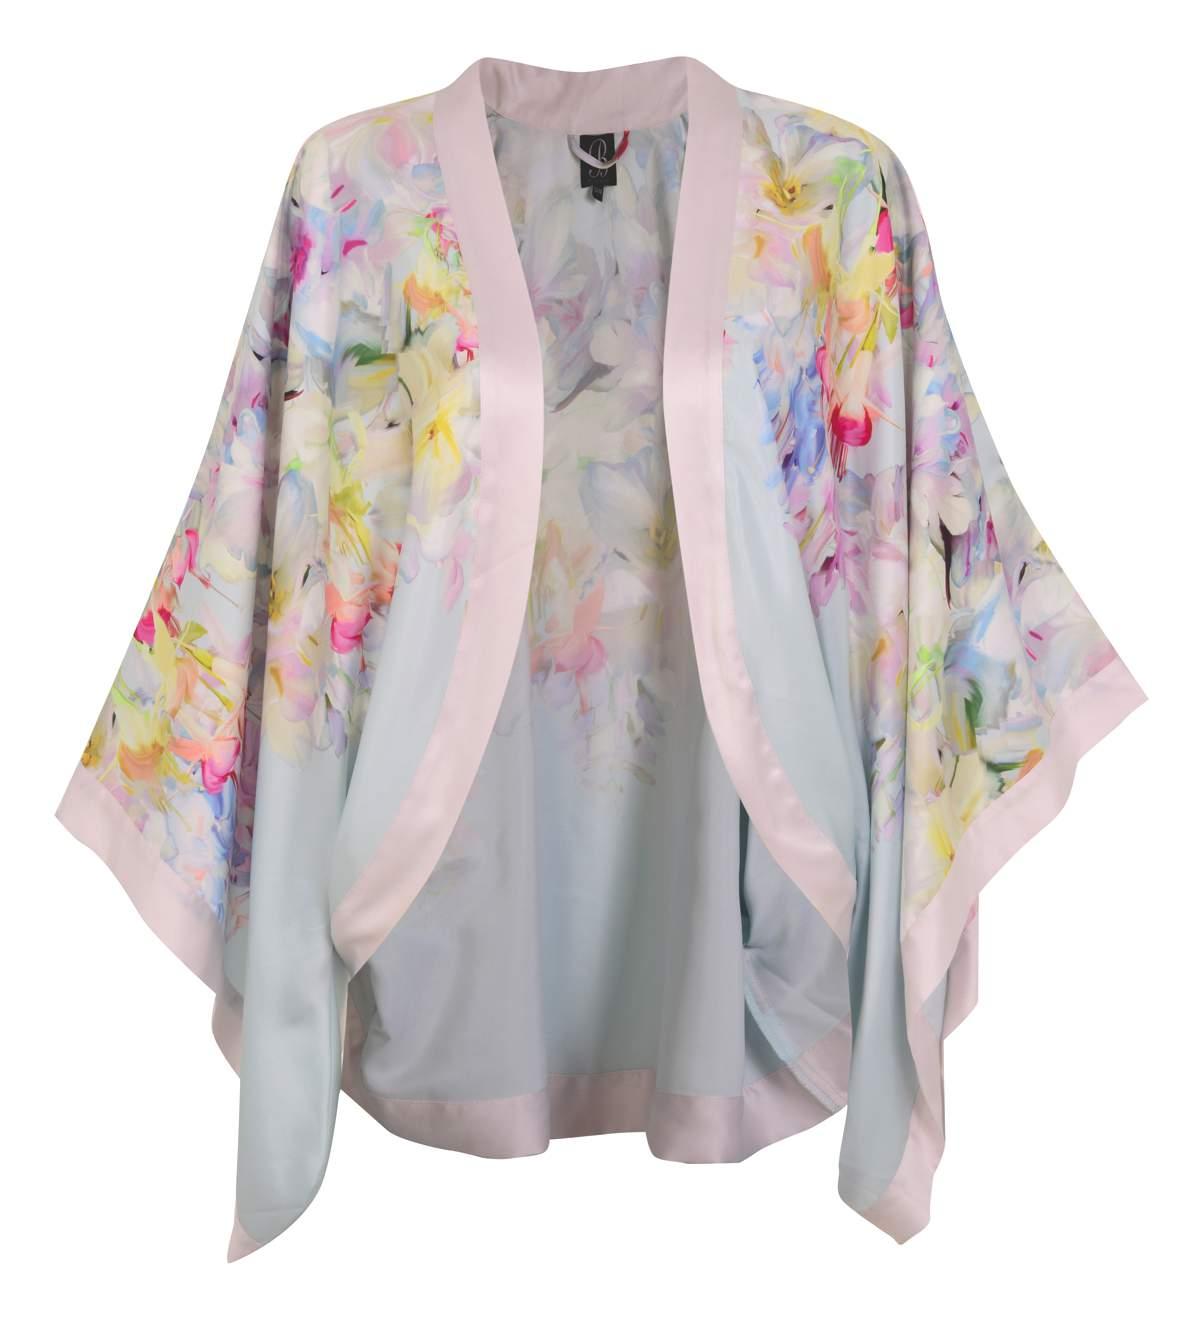 Ted Baker silk robe, £30, Debenhams